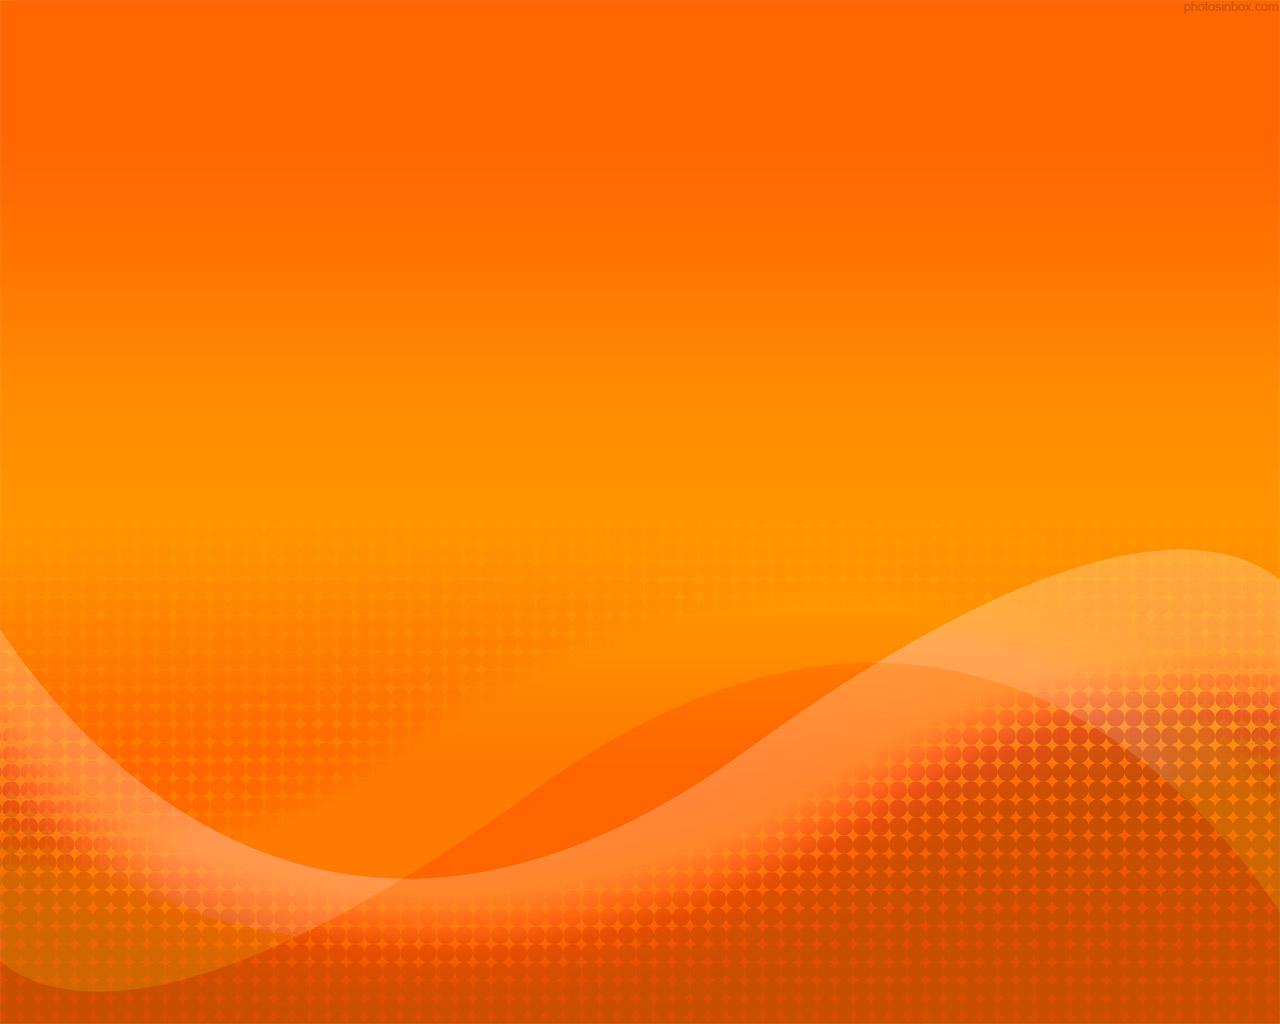 Orange Abstract Backgrounds Orange halfton 1280x1024